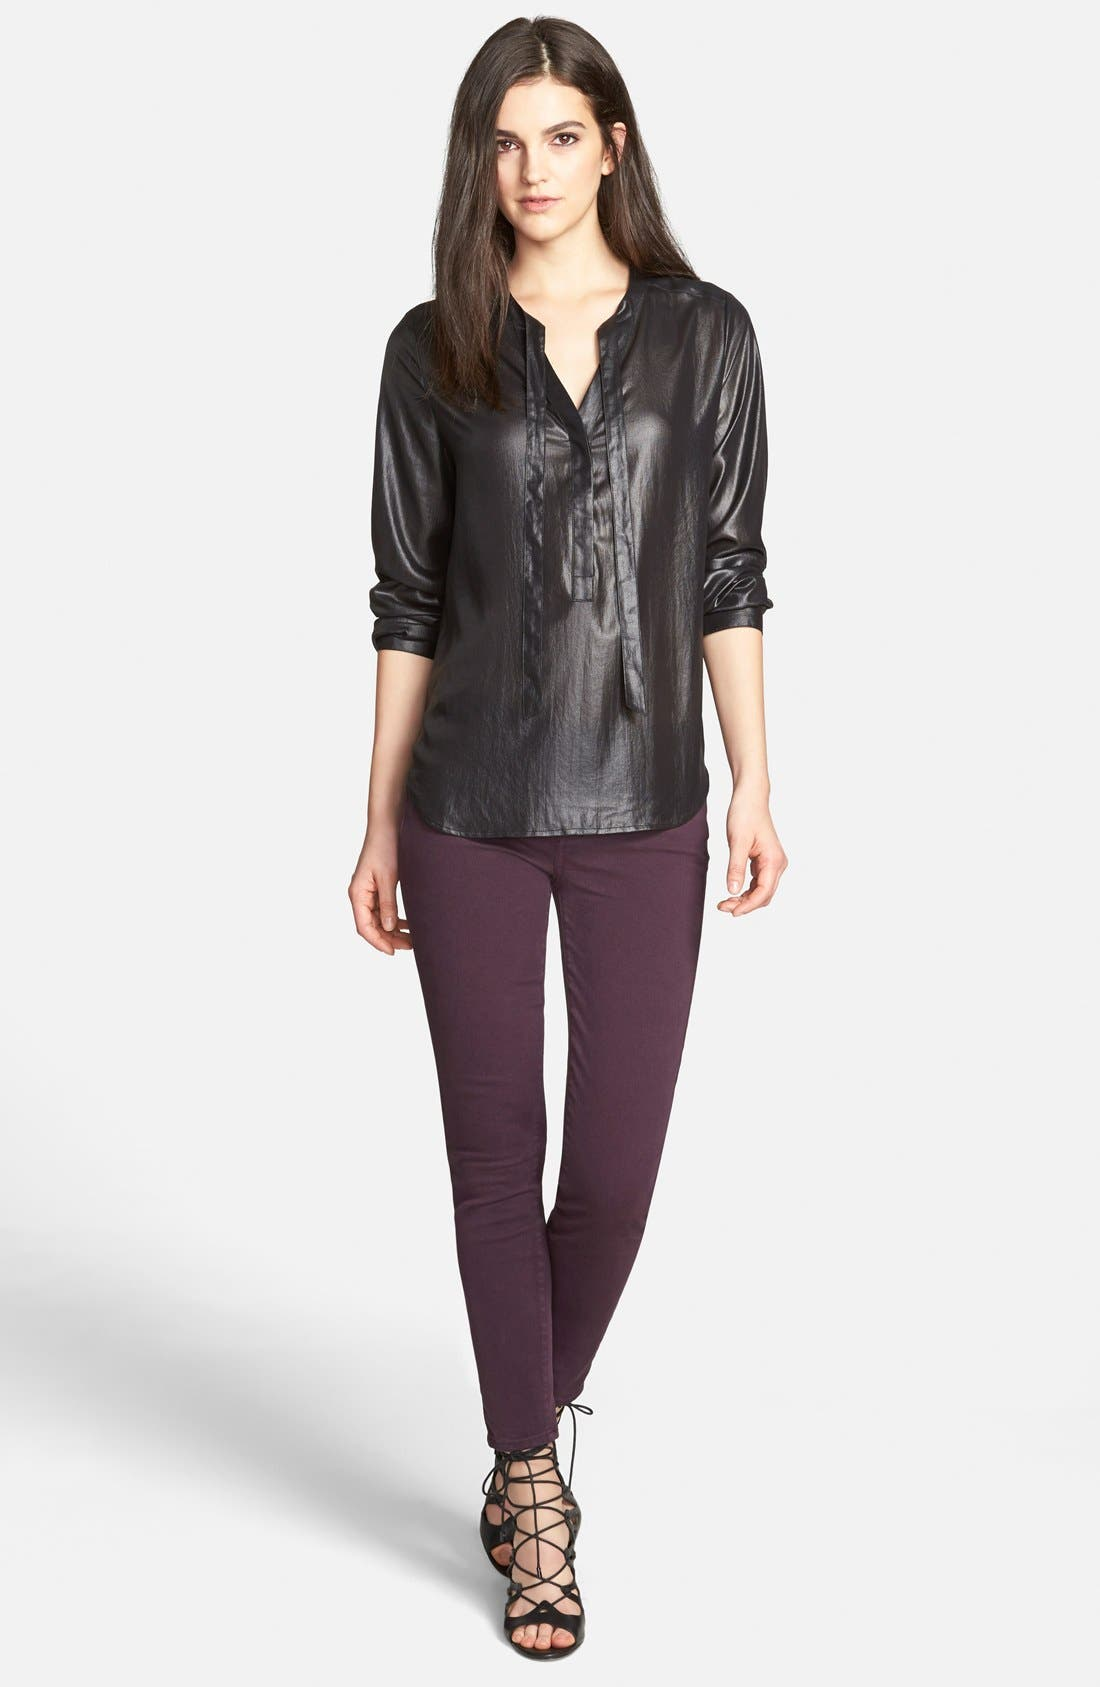 Alternate Image 2  - Paige Denim 'Verdugo' Ankle Skinny Jeans (Autumn Plum) (Nordstrom Exclusive)